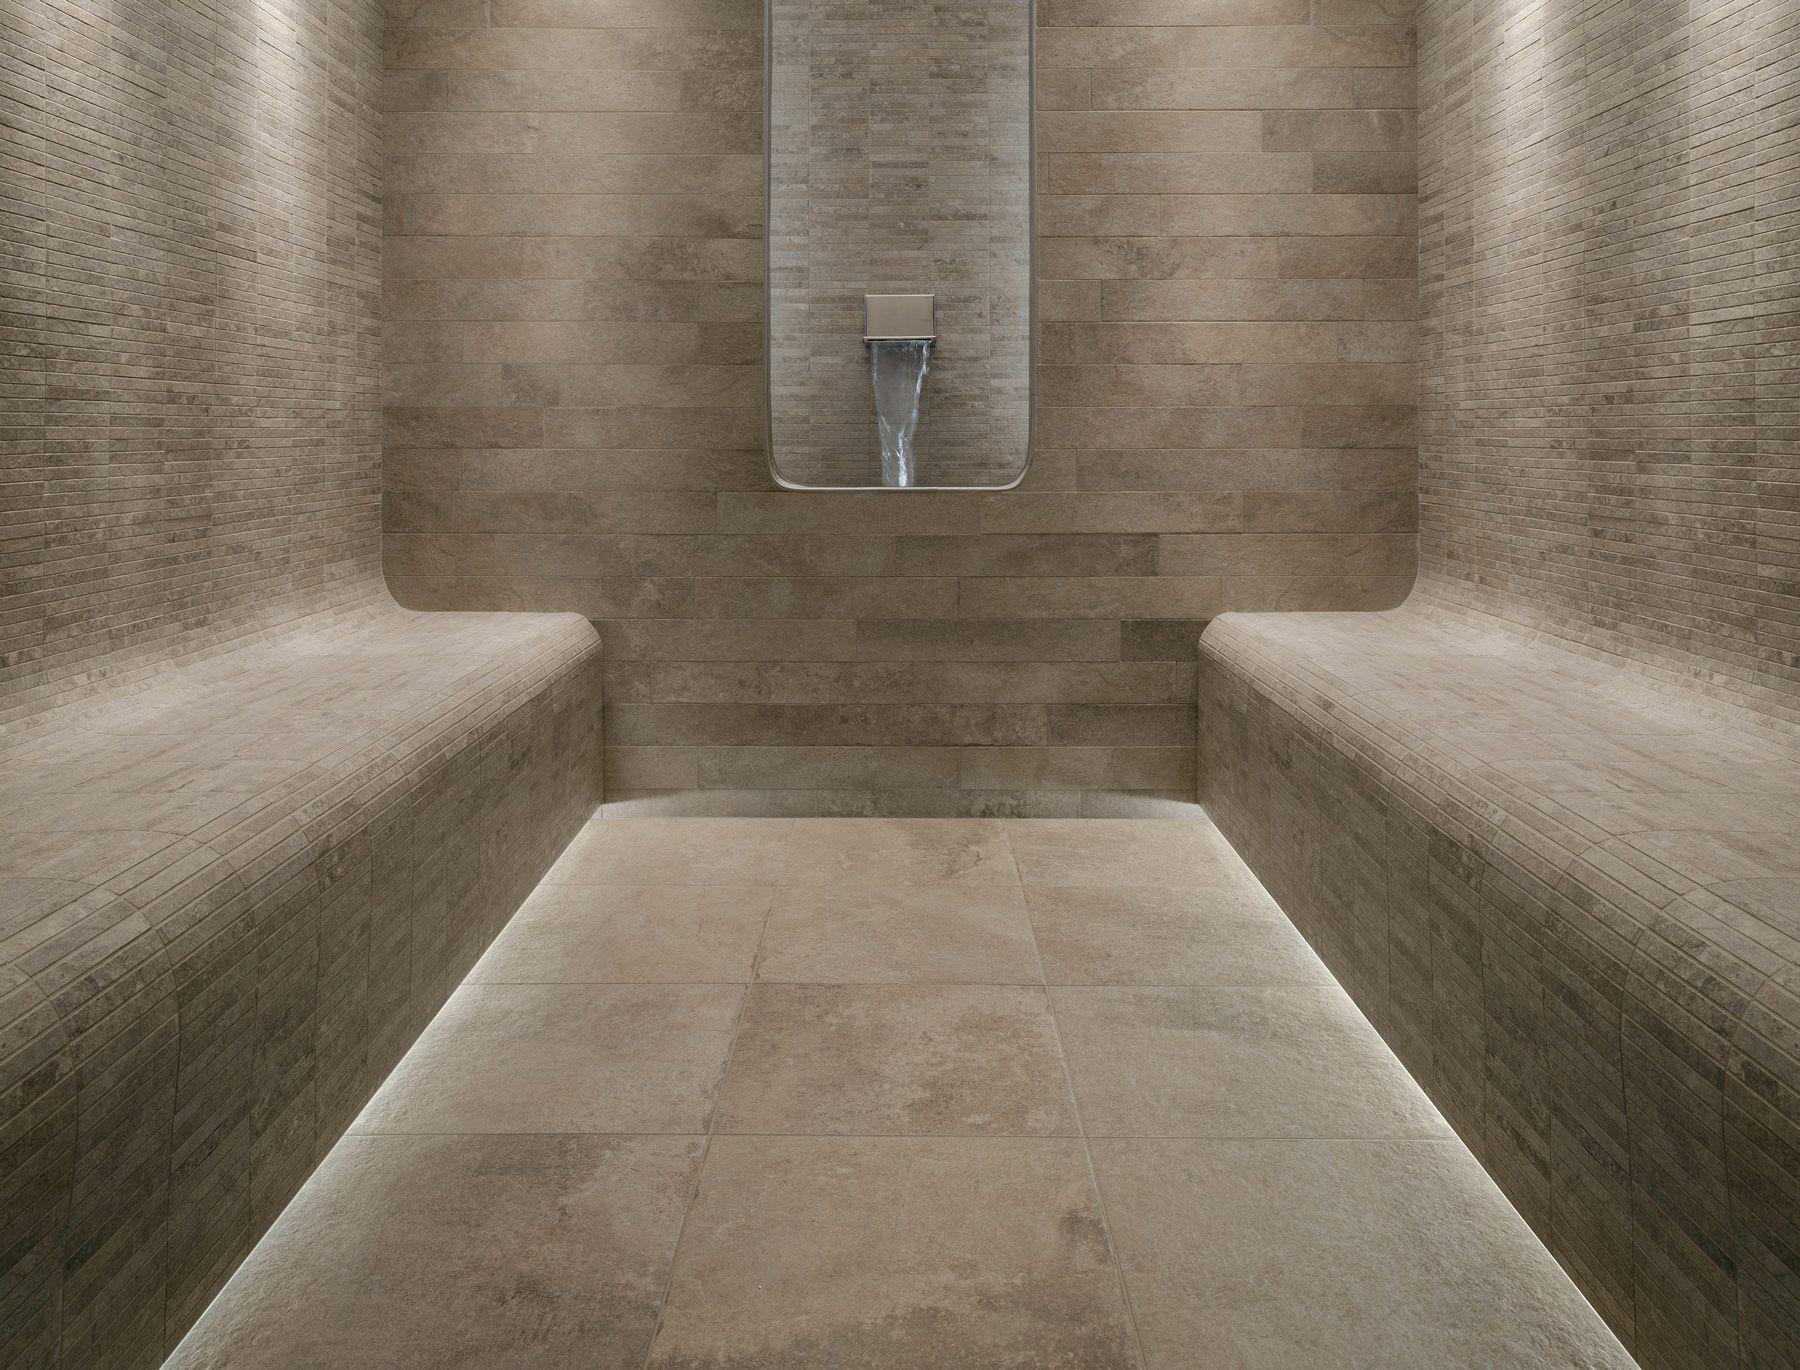 Geo salle de bains salle et spa - Carrelage beige salon ...